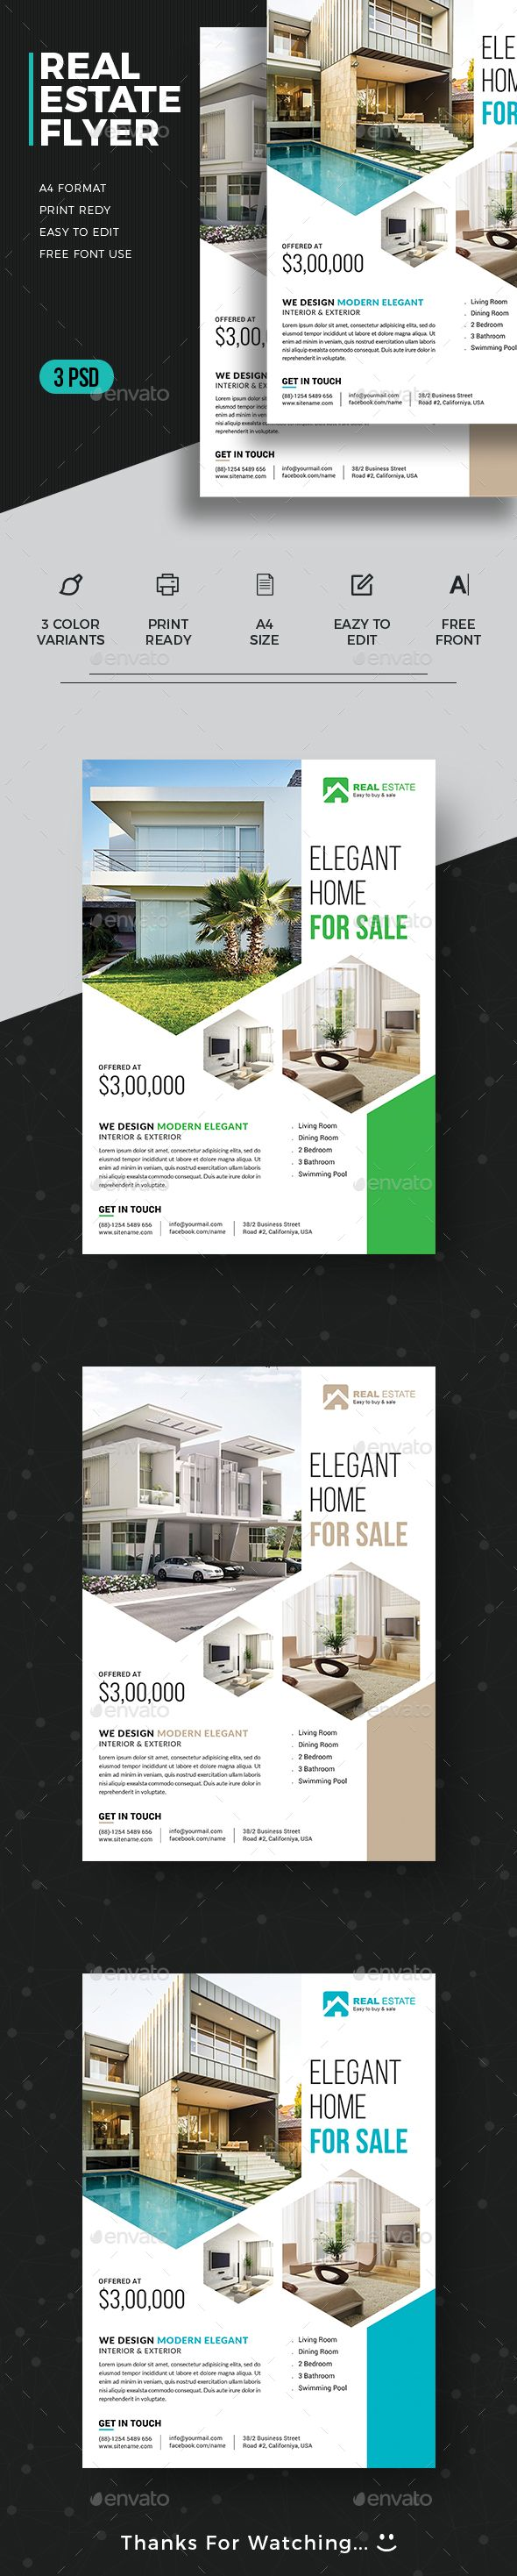 #Real #Estate #Flyer - Commerce Flyers Download here: https://graphicriver.net/item/real-estate-flyer/19550607?ref=alena994